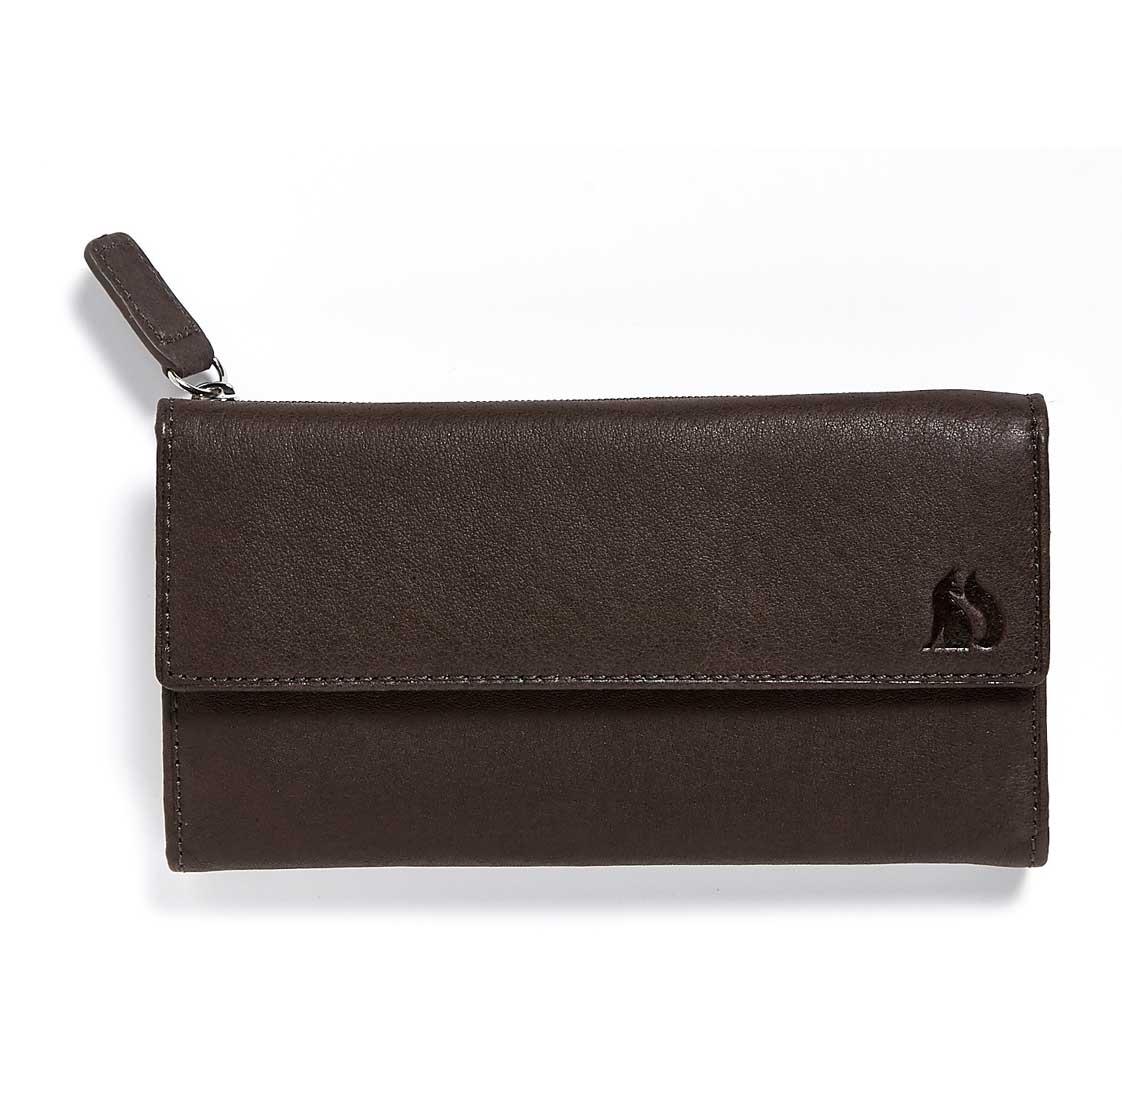 Foxfield Brown Leather Purse Windermere